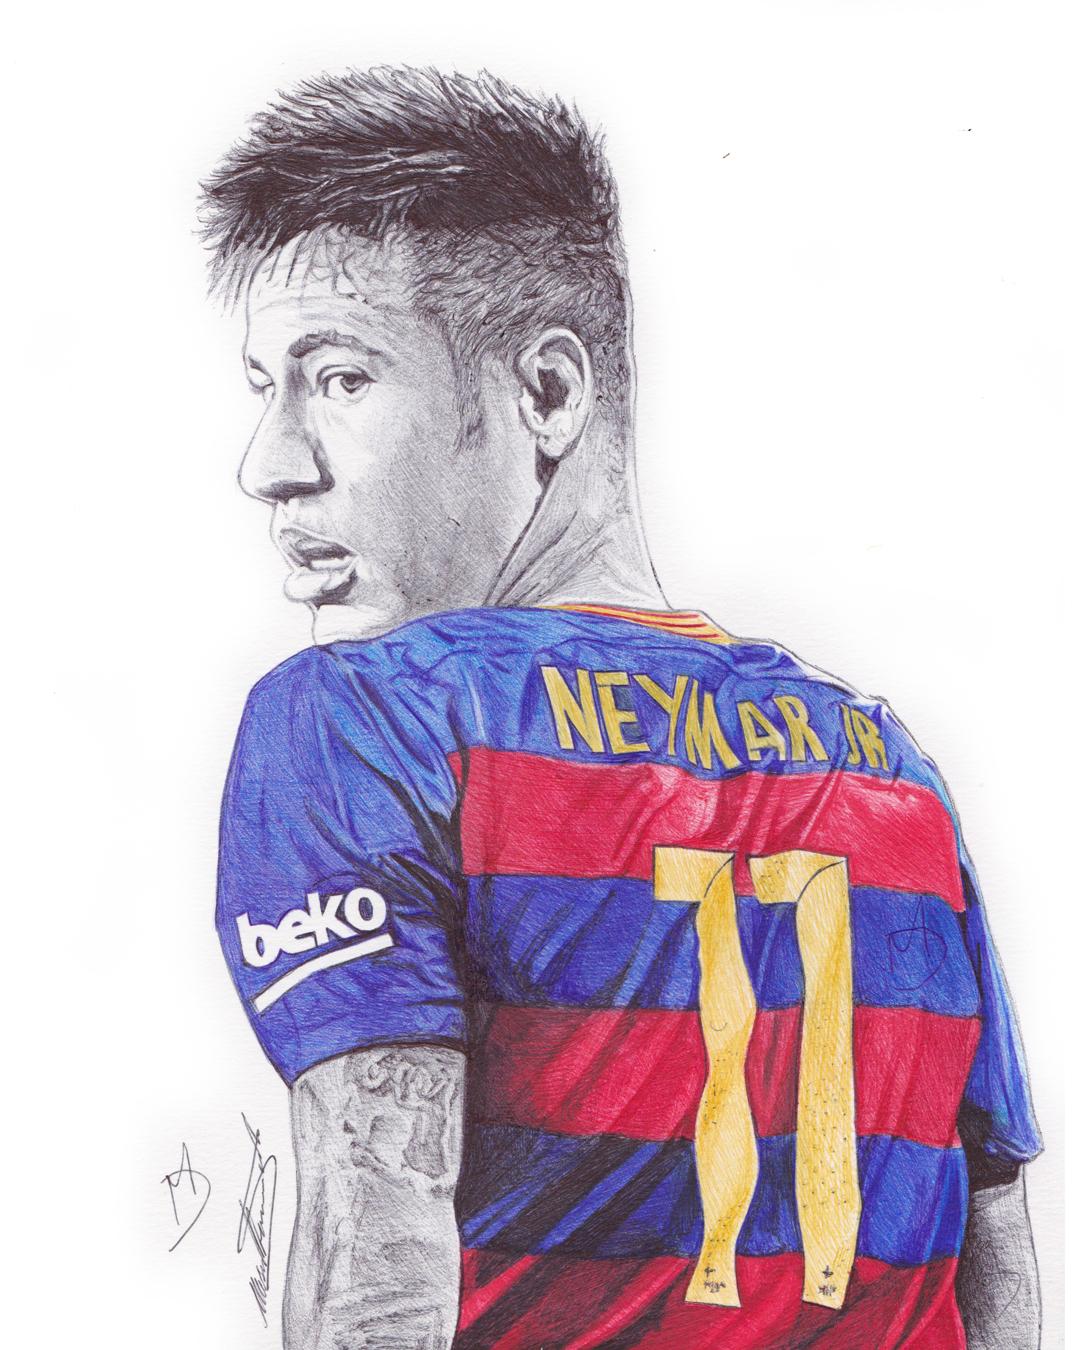 Demoose art 165k subscribers subscribe · neymar jr pen drawing